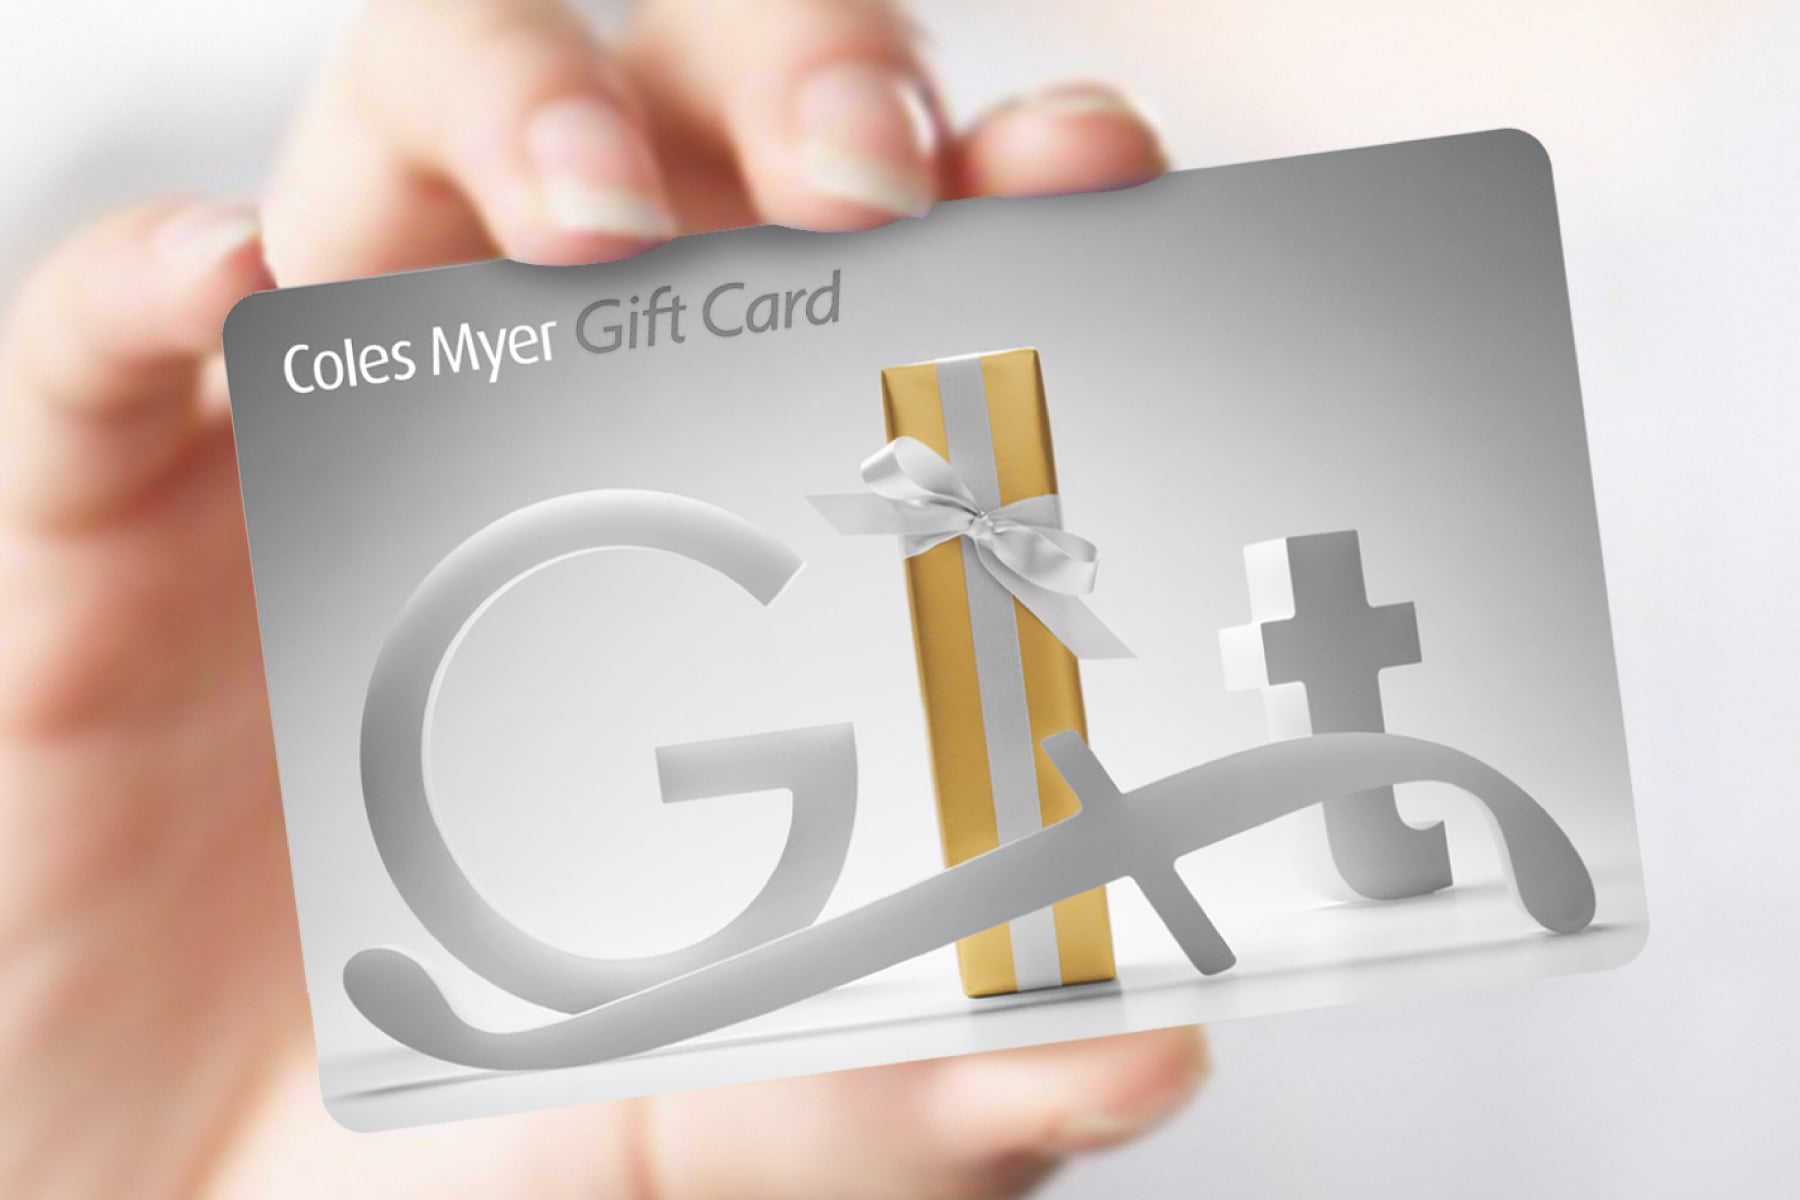 Davidson Branding Retail Coles Myer Gift Card Present Box